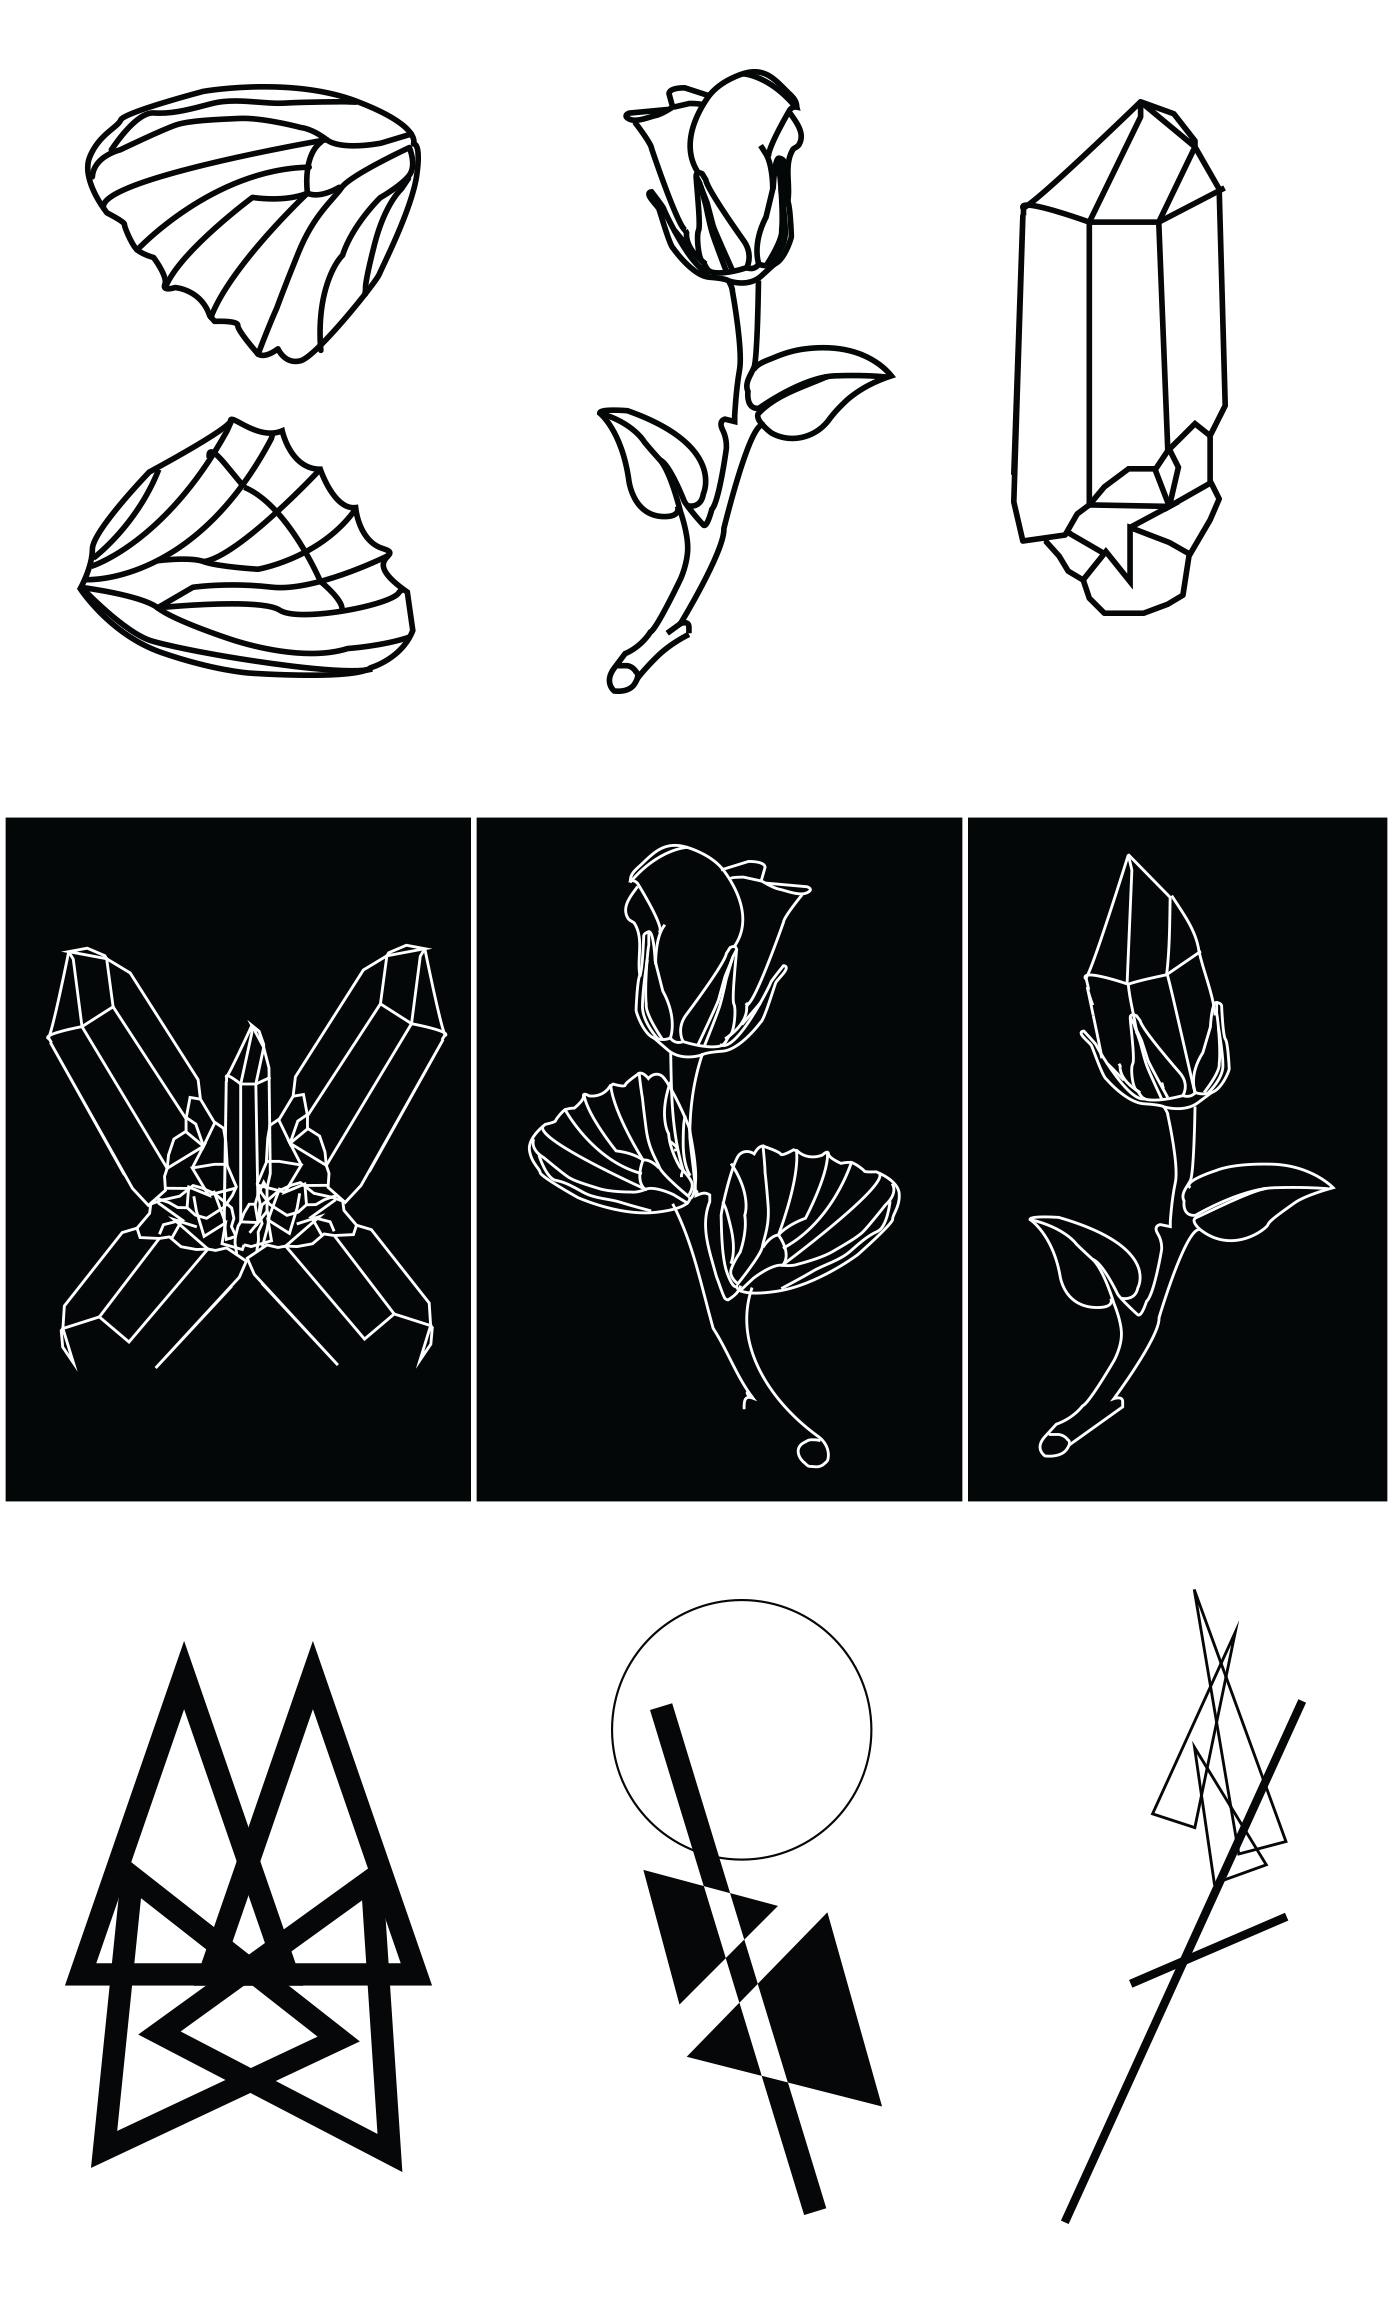 Digital Artifacts Line Art + Symbols